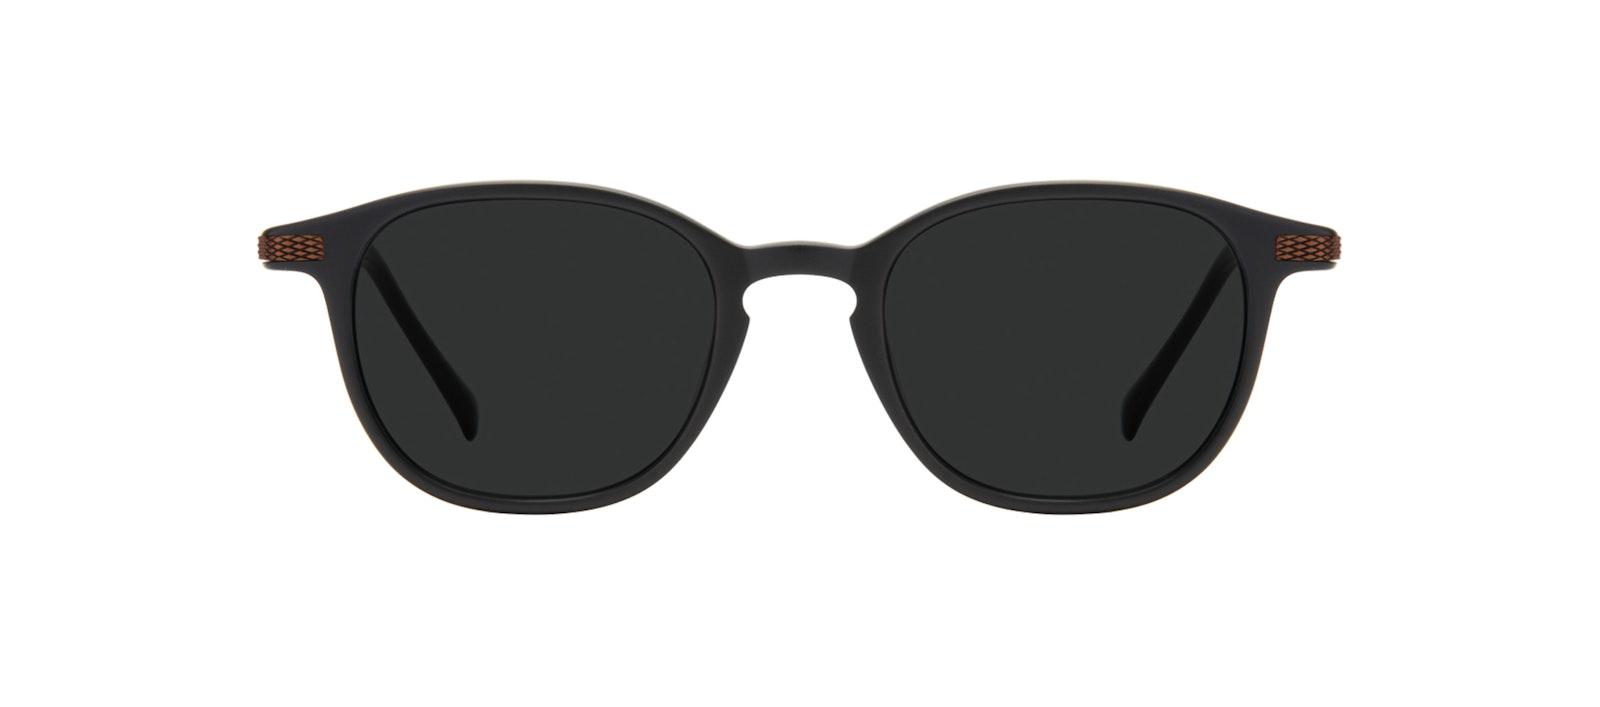 Affordable Fashion Glasses Round Sunglasses Men Tux Onyx Matte Front